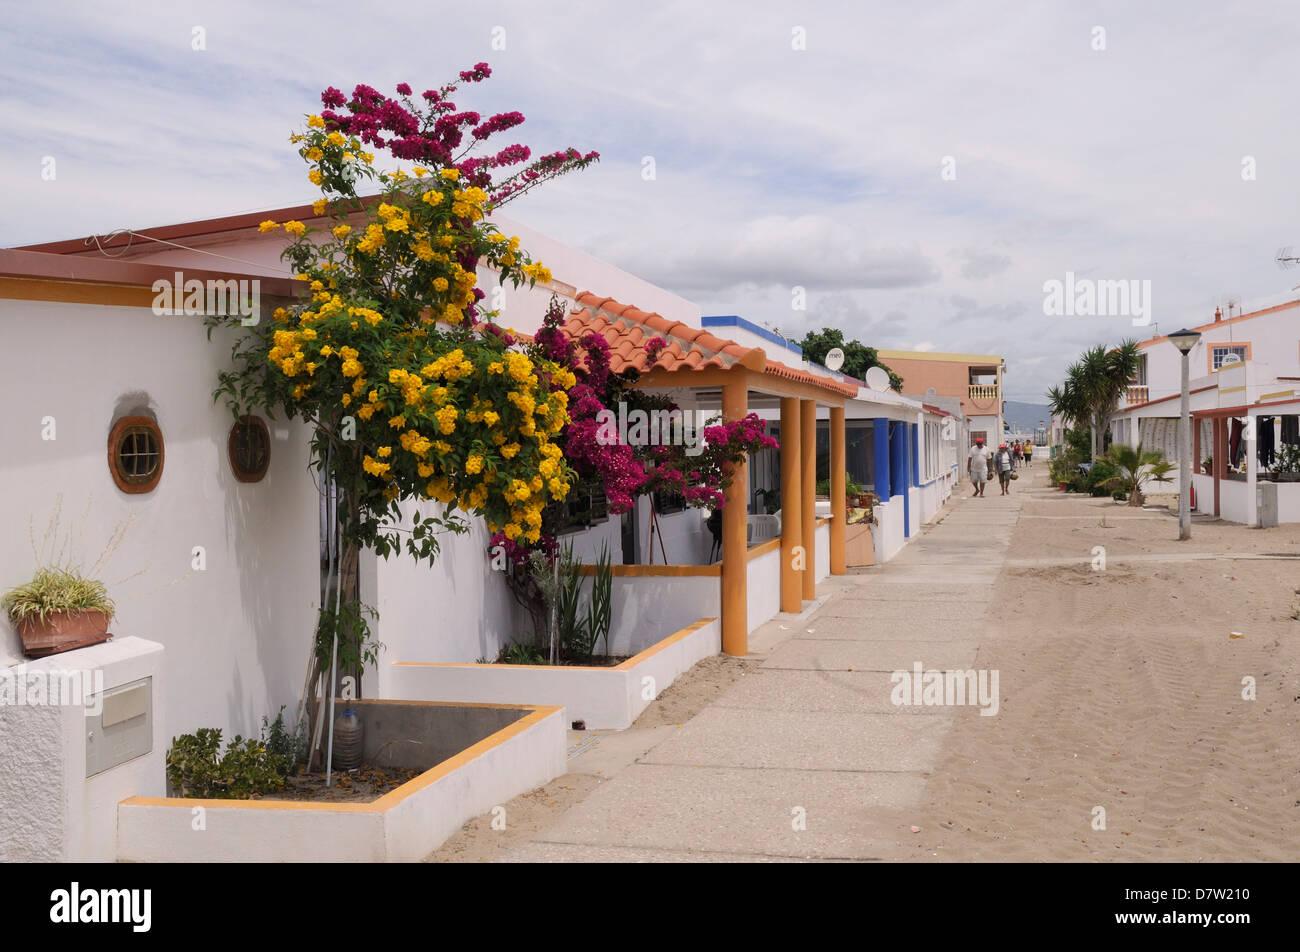 Main street of fishermen's village on Culatra island, Parque Natural da Ria Formosa, near Olhao, Algarve, Portugal - Stock Image